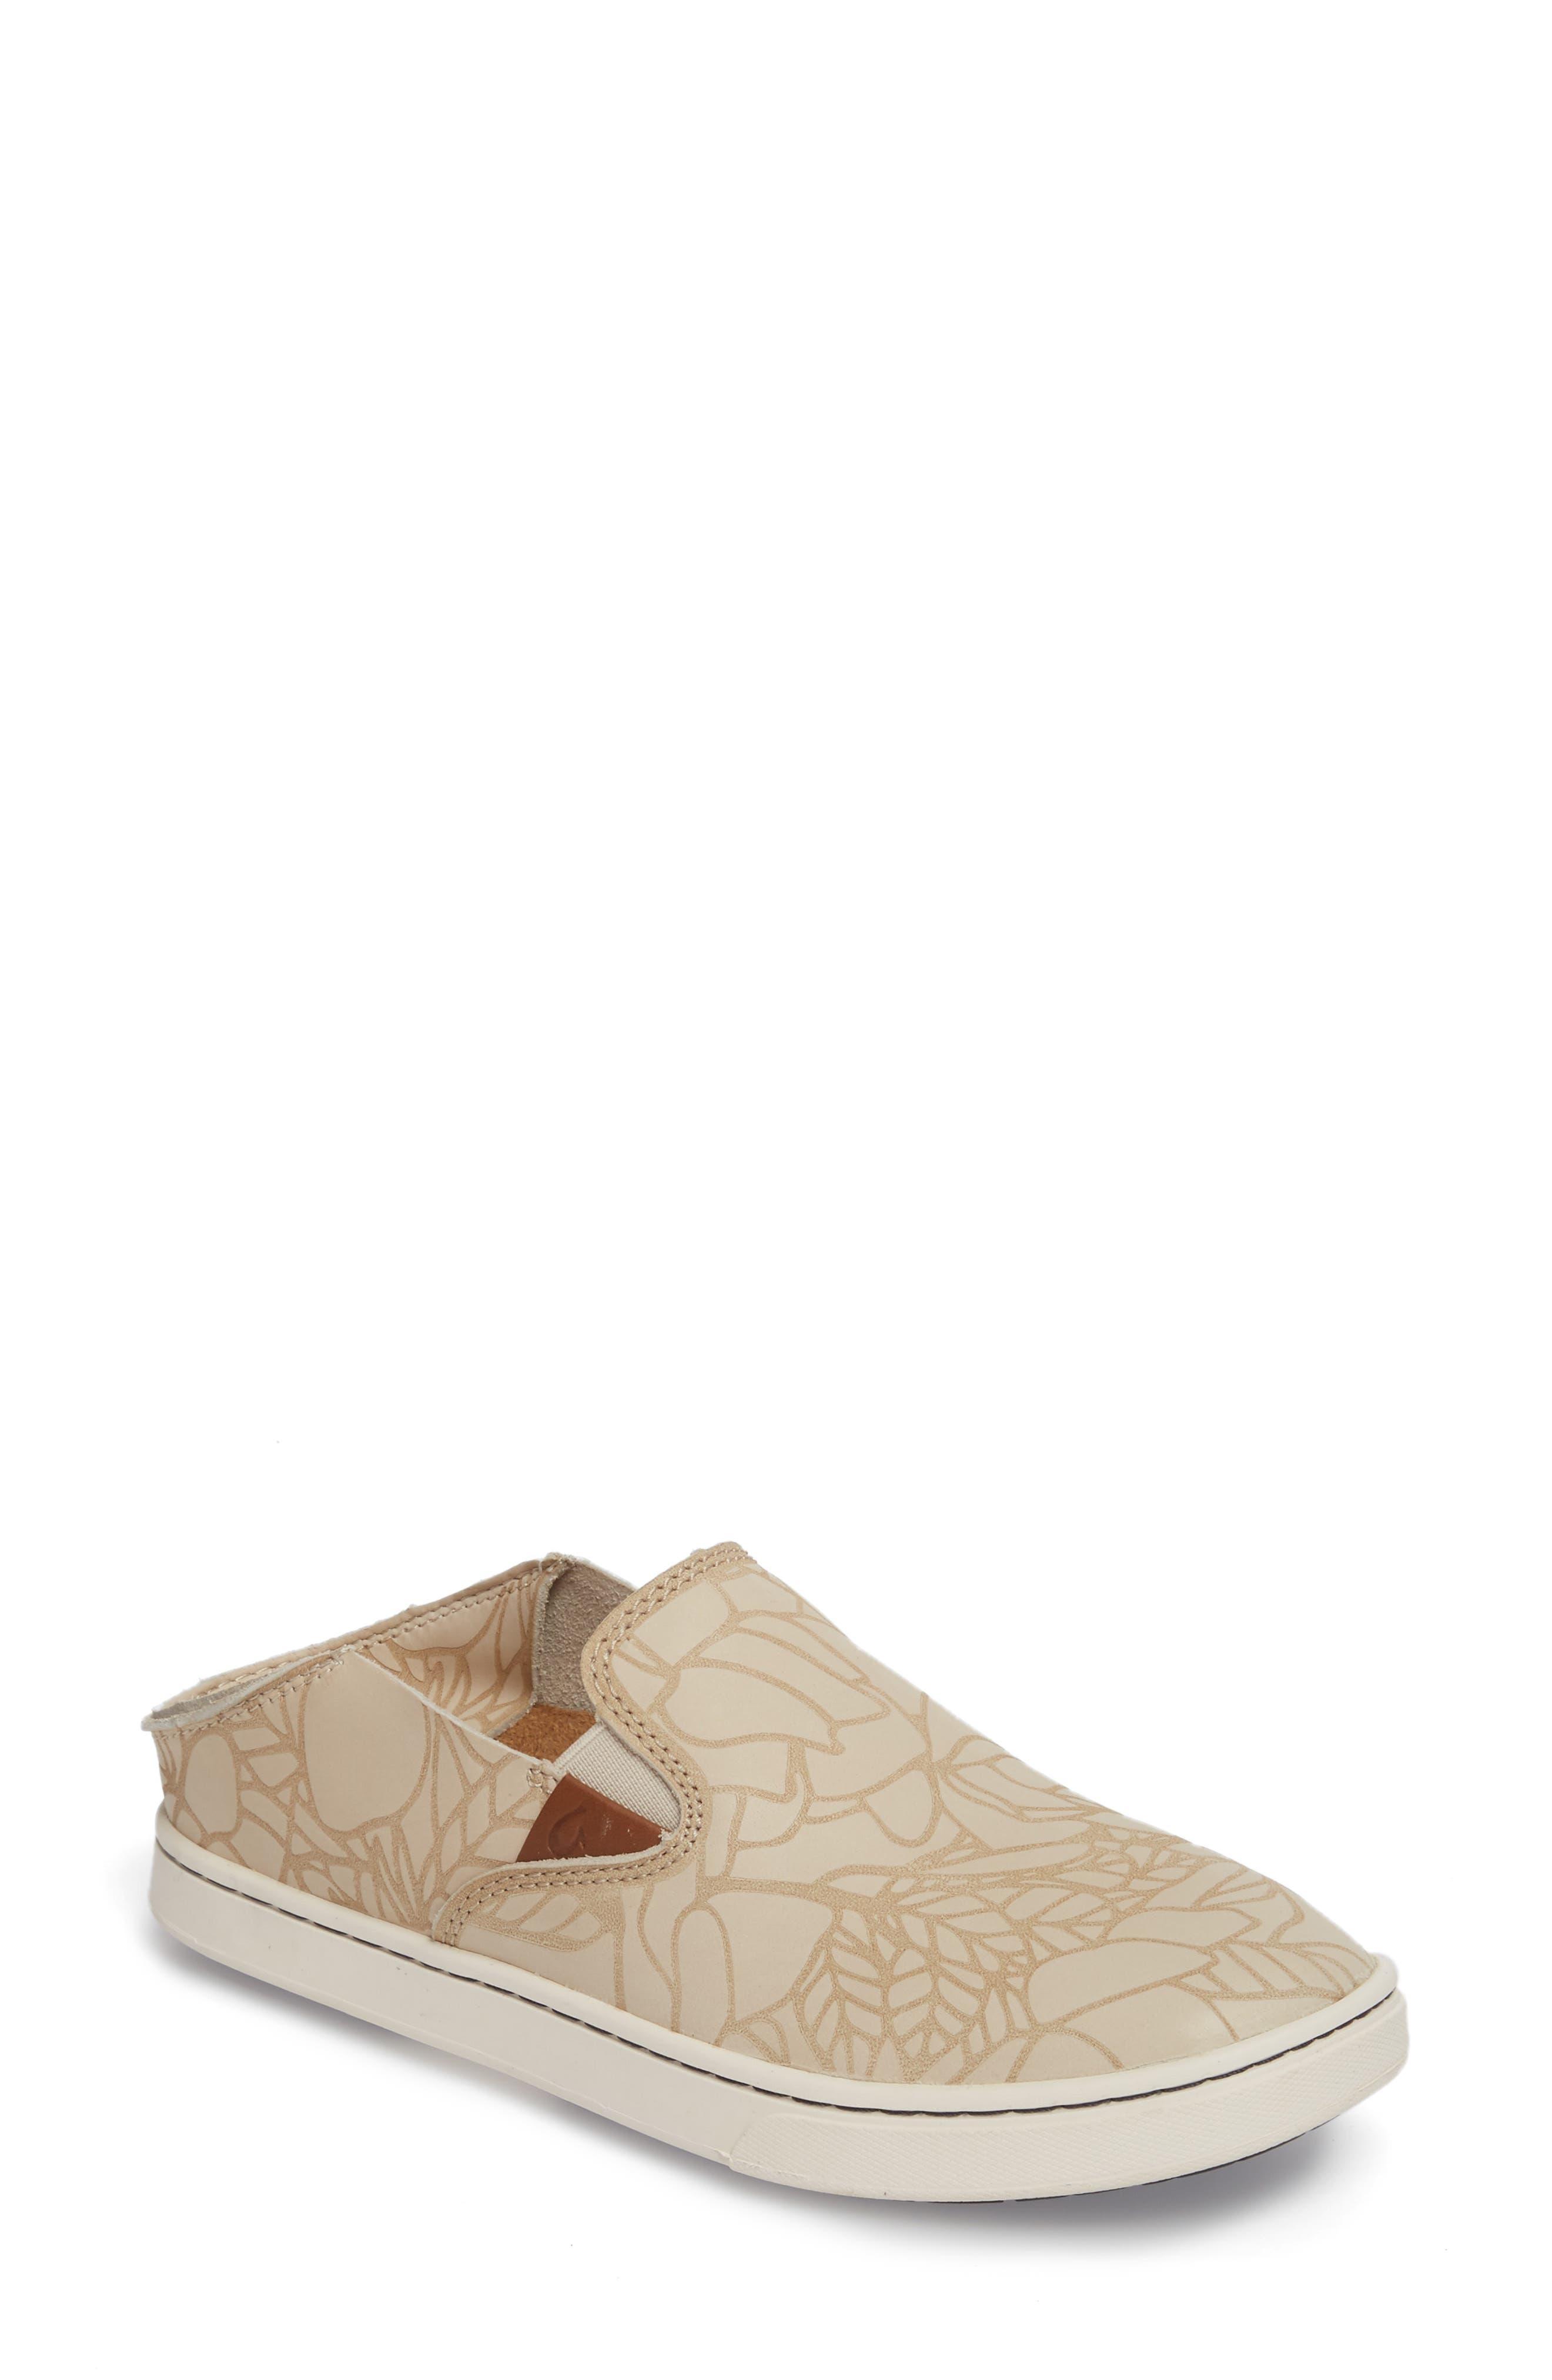 Pehuea Lau Slip-On Sneaker,                         Main,                         color, TAPA/ TAPA FABRIC